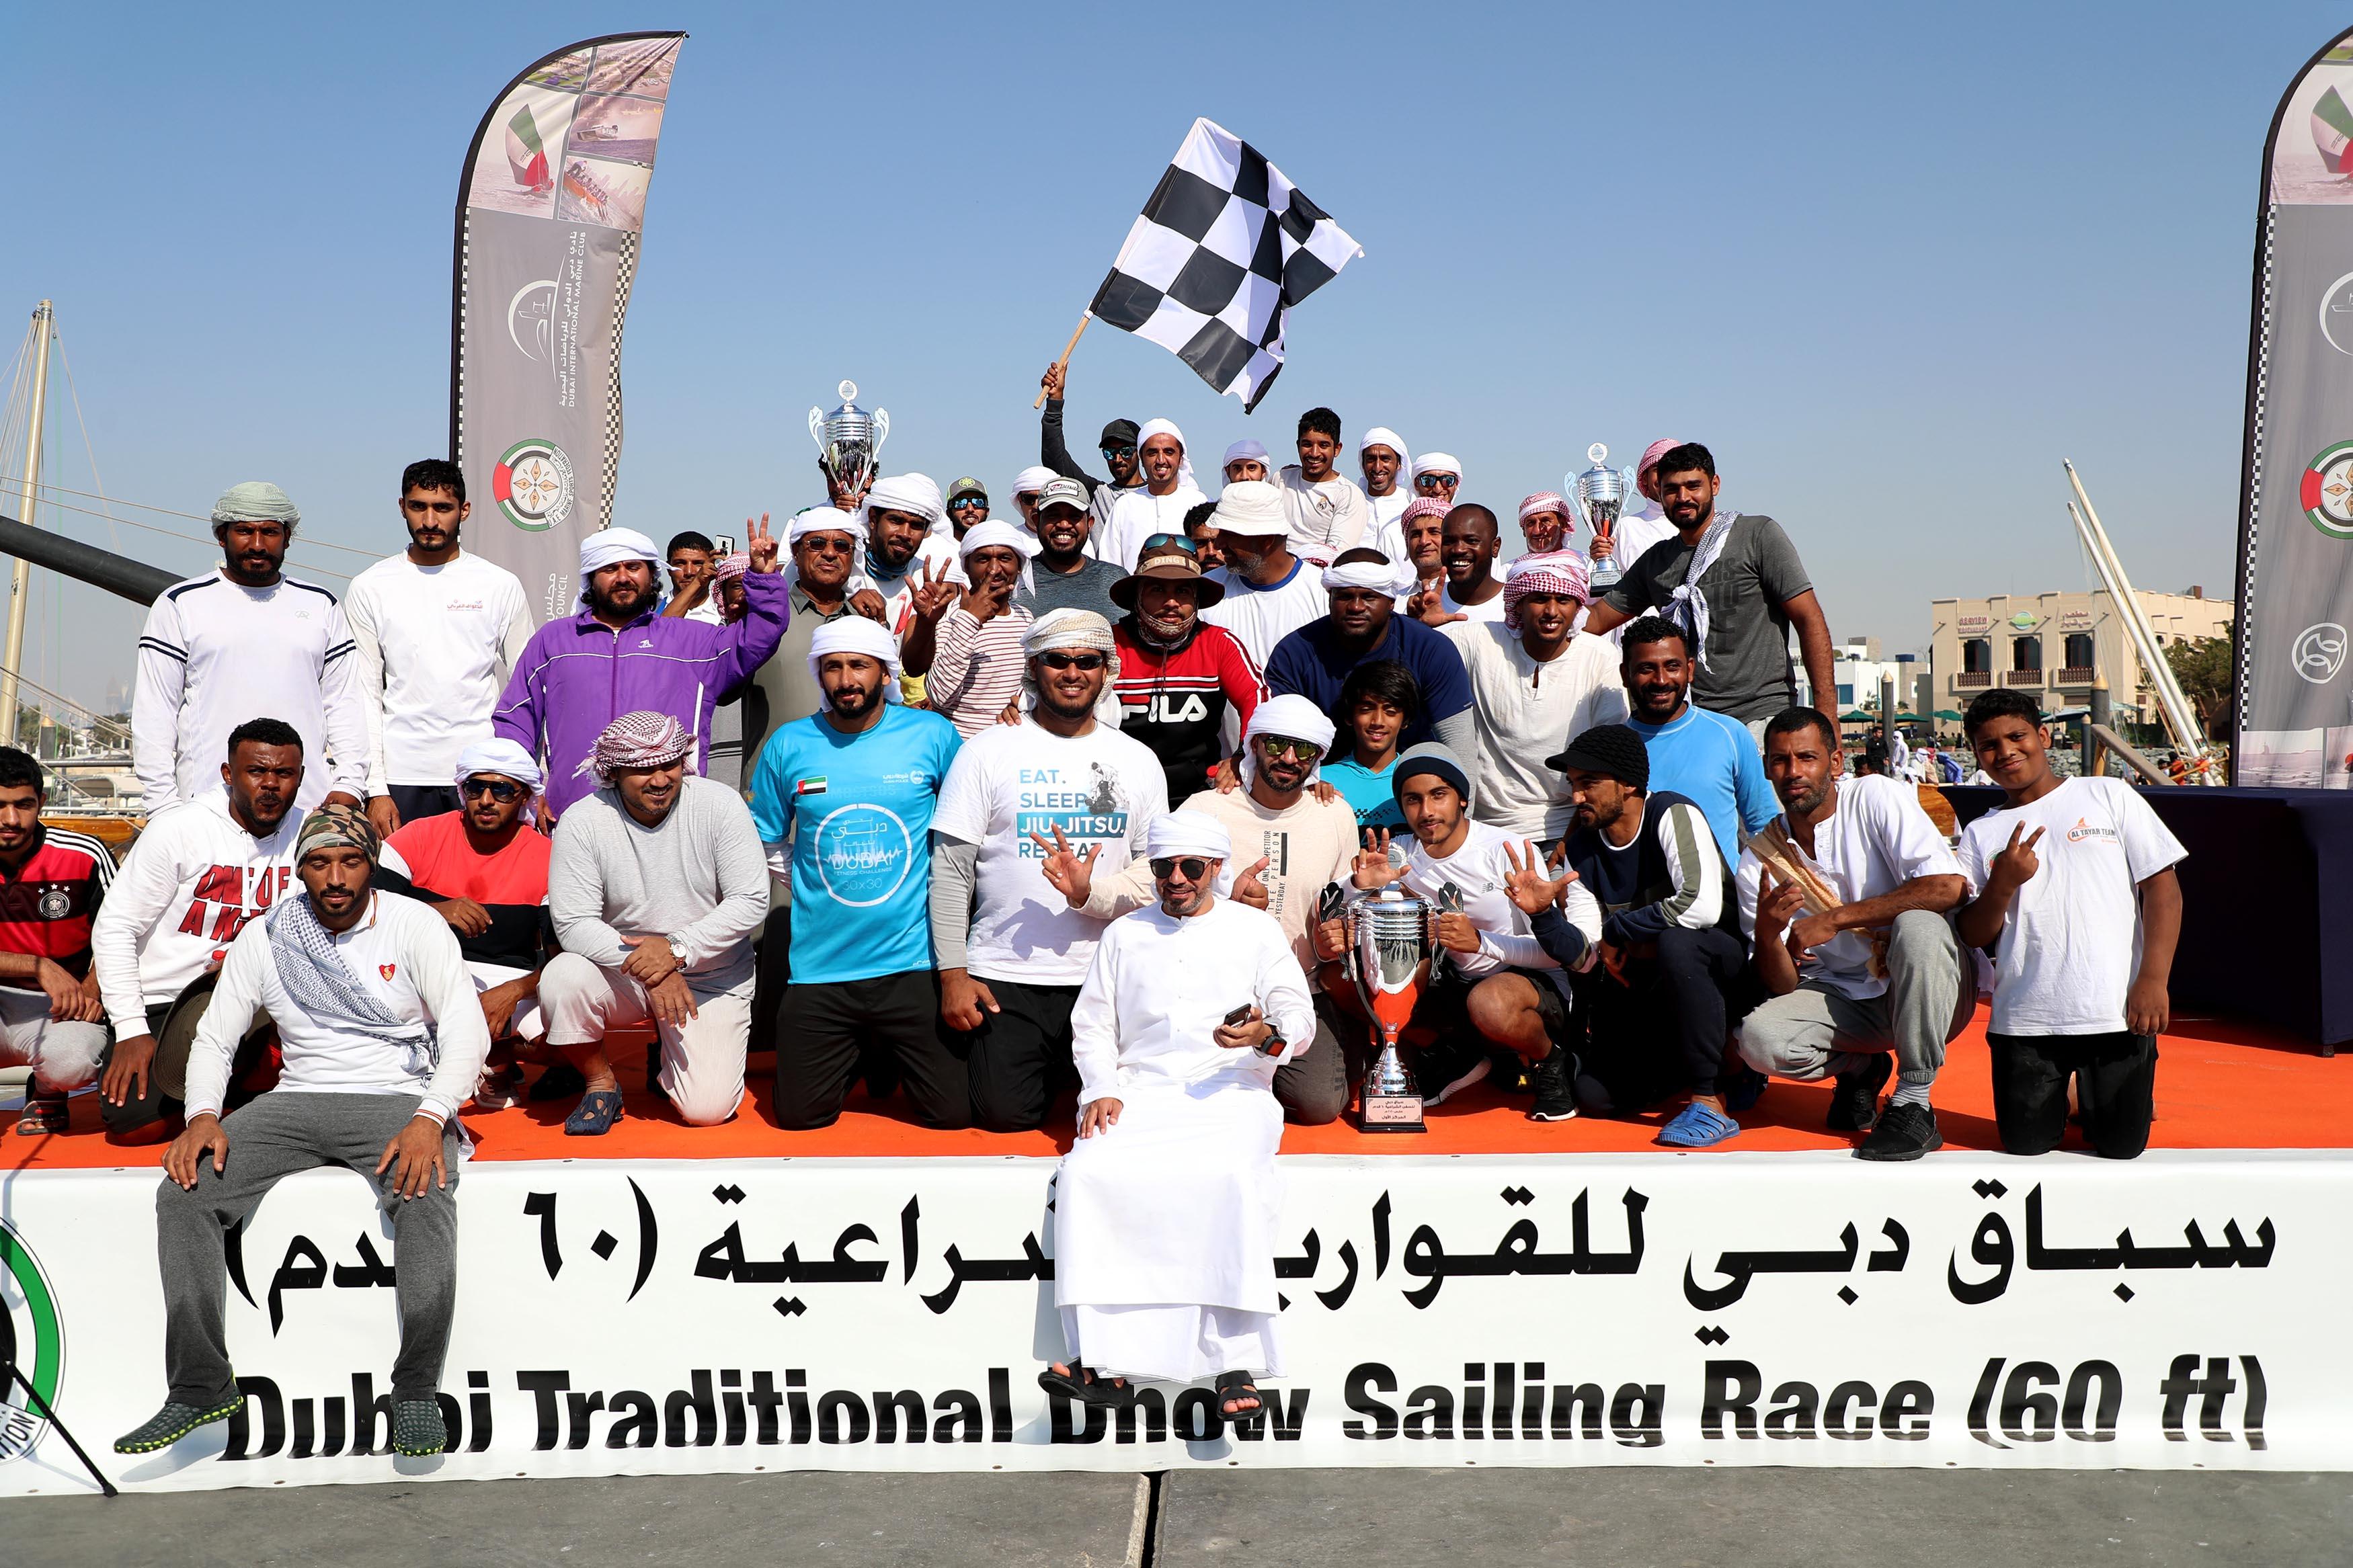 Al Shaqi 96 wins the 60ft Dubai Traditional Dhow Sailing Race